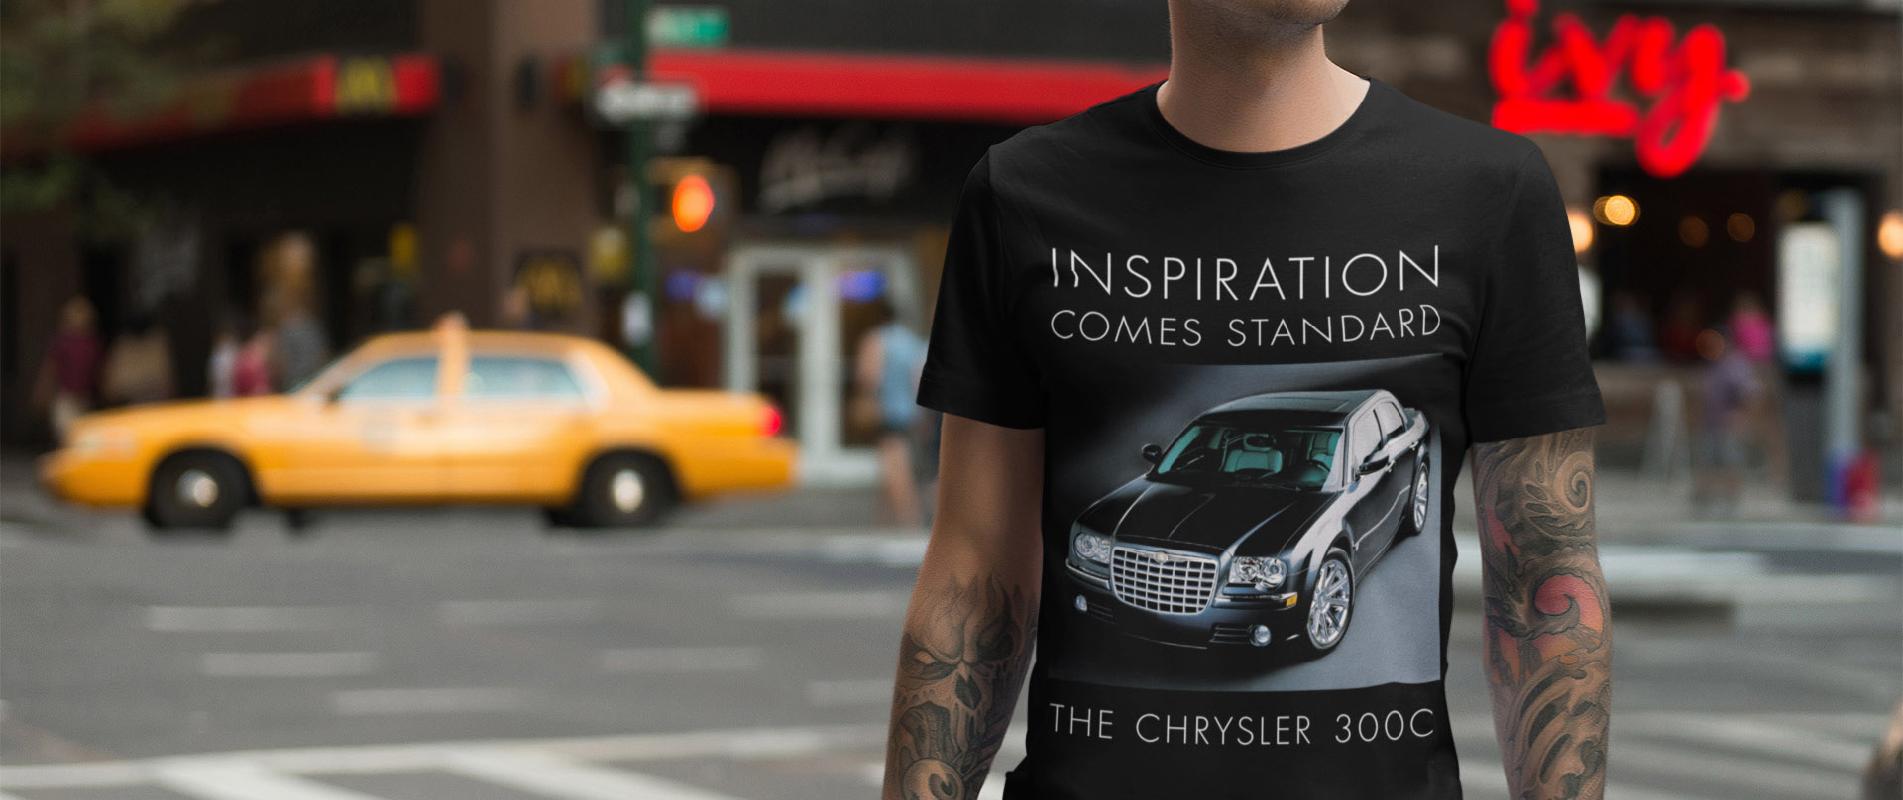 Tattooed man on a New York street wearing a Chrysler 300C t shirt